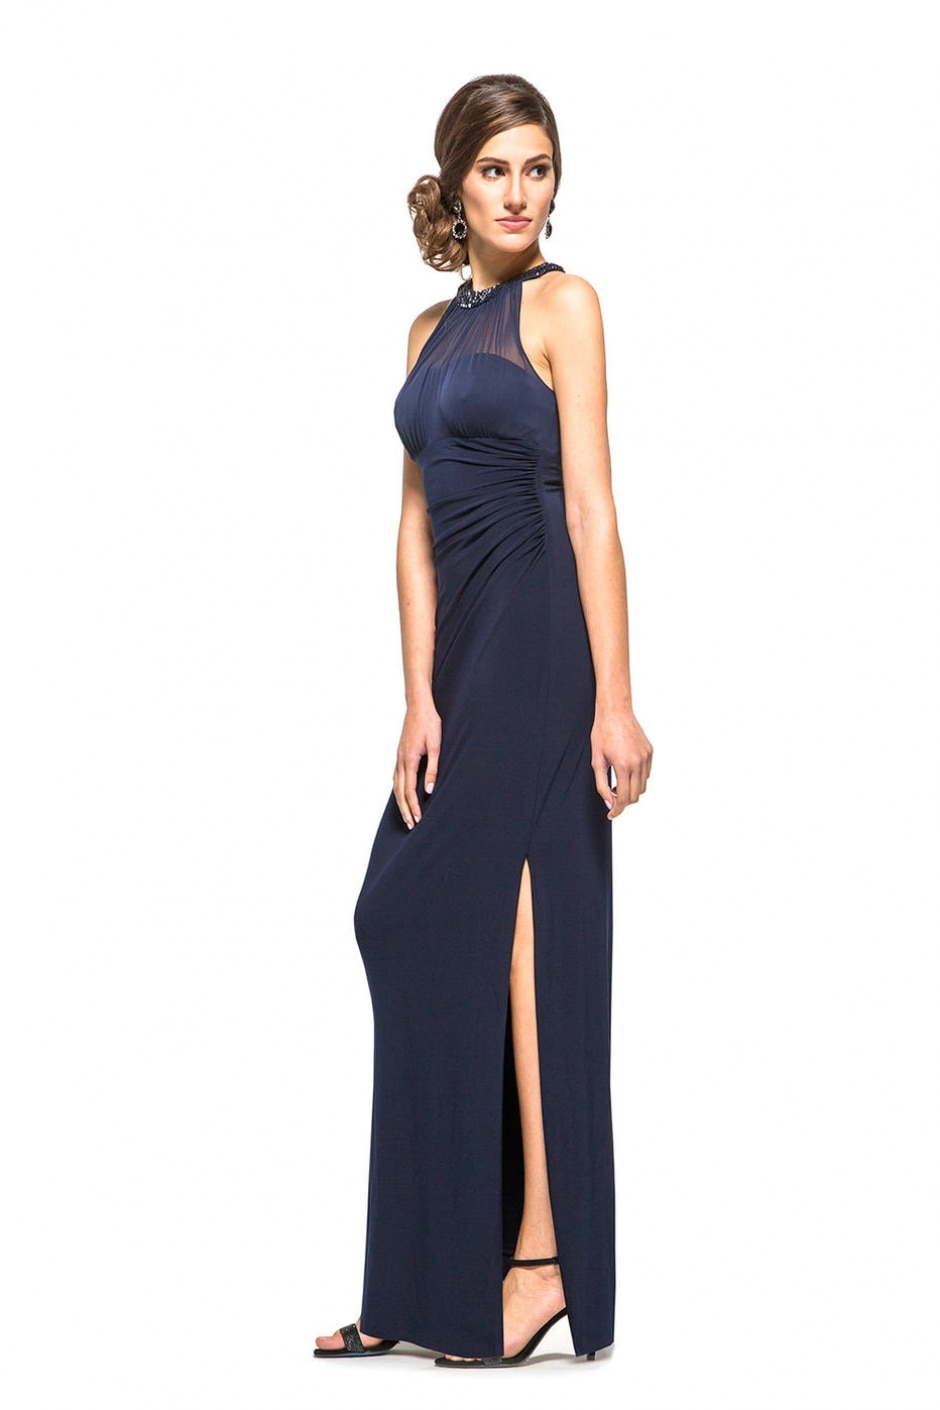 6cde7aa83 Lojas oferecem aluguel de vestidos de estilistas badalados - Emais ...